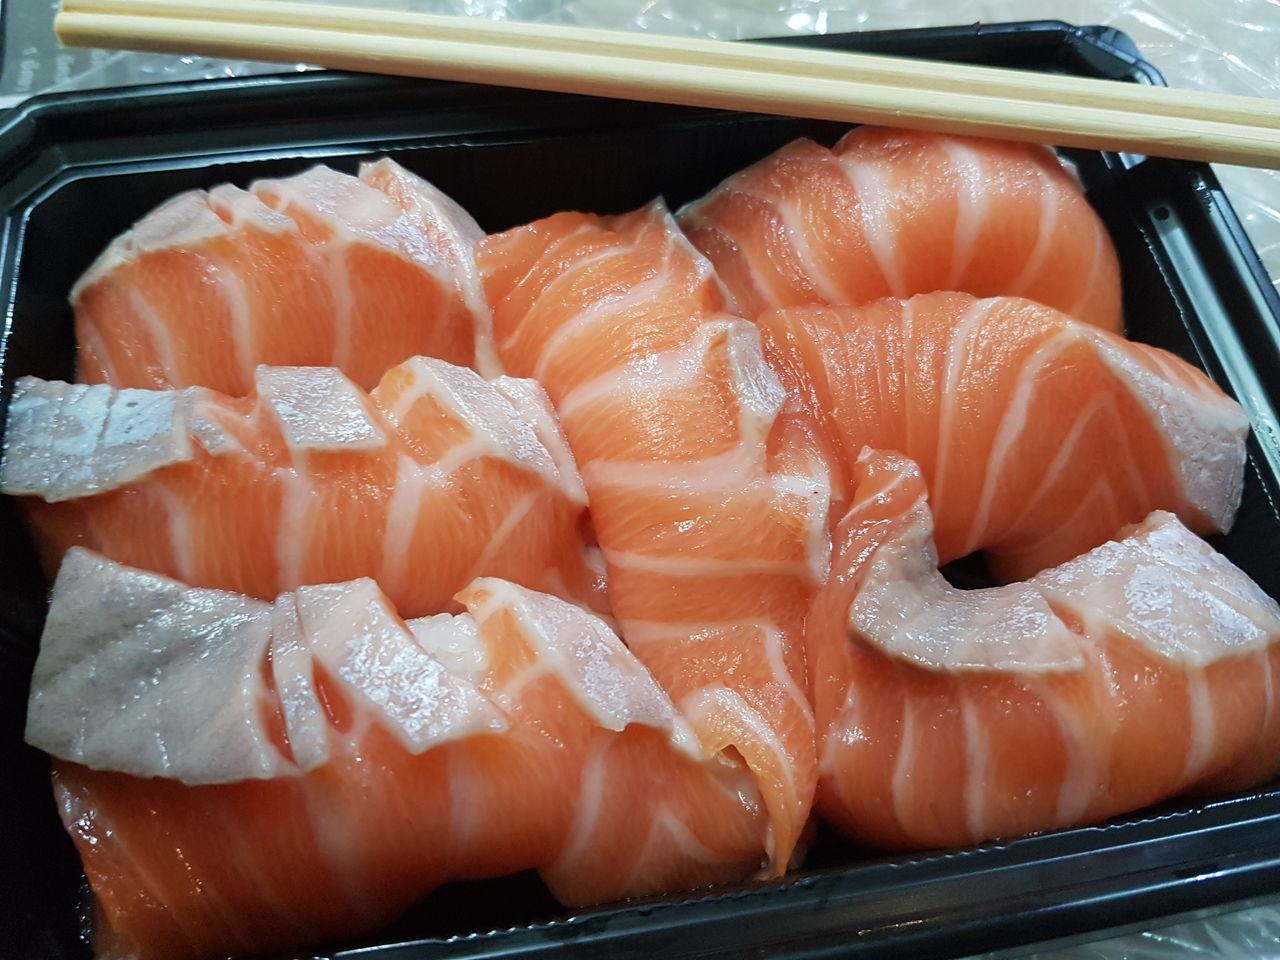 Salmon. Seafood Food Sushi Sashimi  Raw Food Salmon Fish Japan Japanese Food Delicious Salmon Sashimi Salmon Sushi Yummy Salmon Close Up Salmon Dish